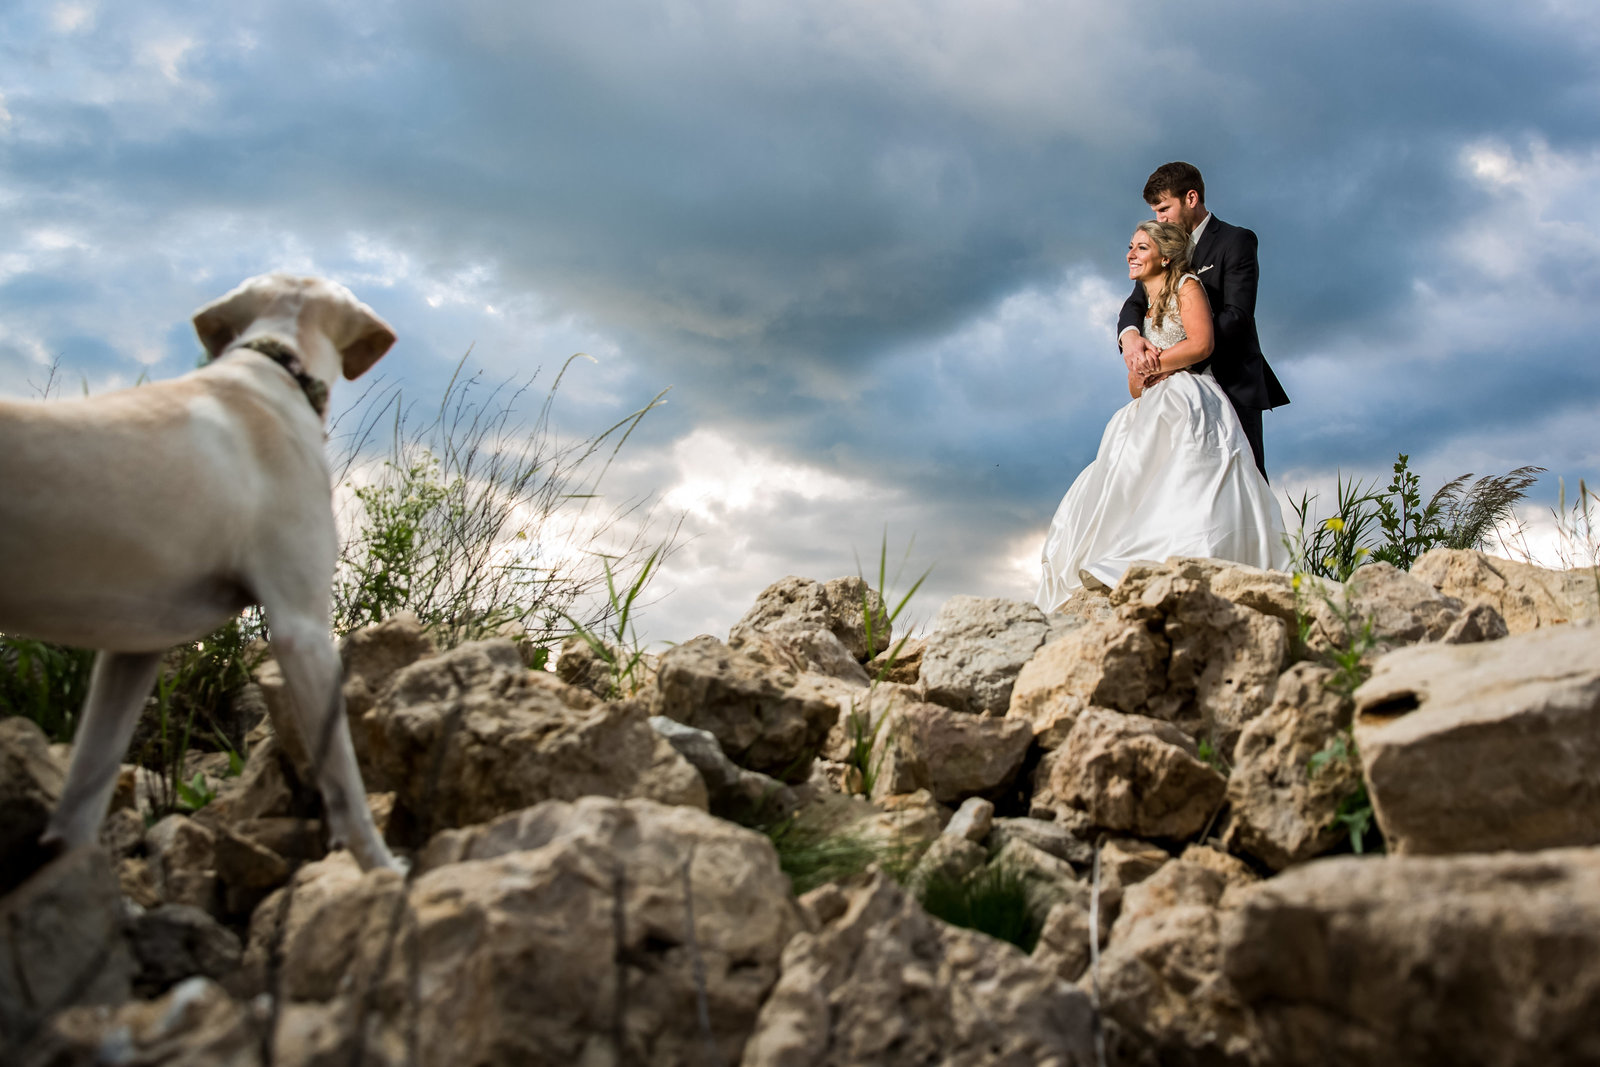 Penny Photographics   Minneapolis Wedding Photographer with Texas roots